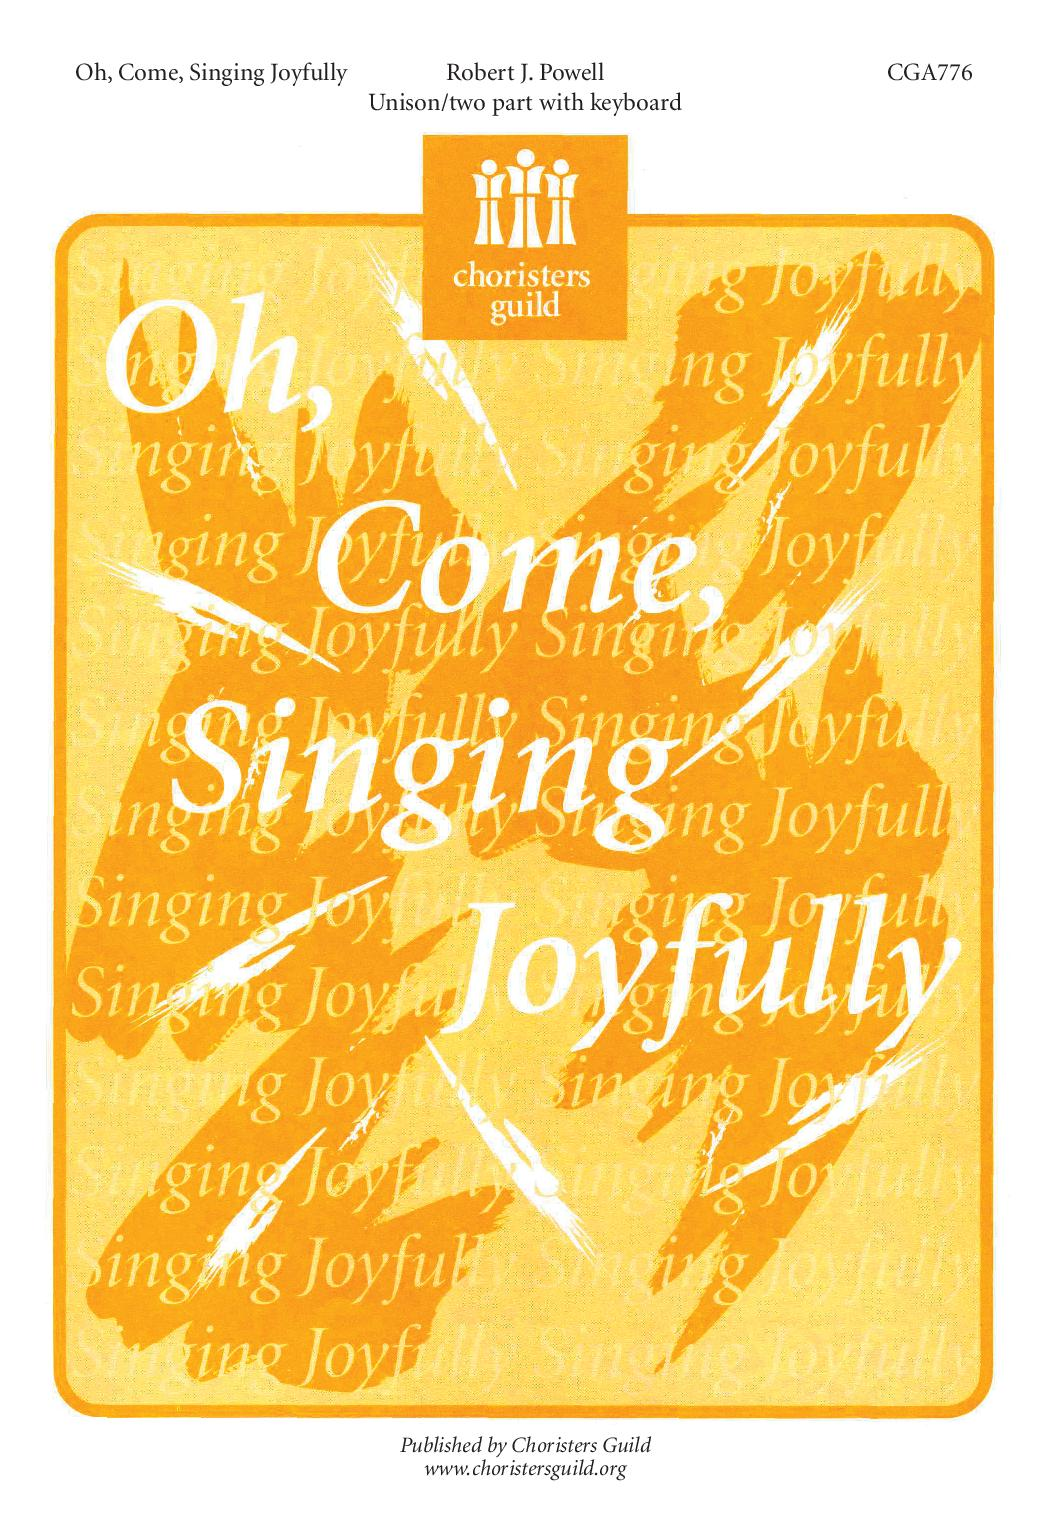 Oh, Come, Singing Joyfully